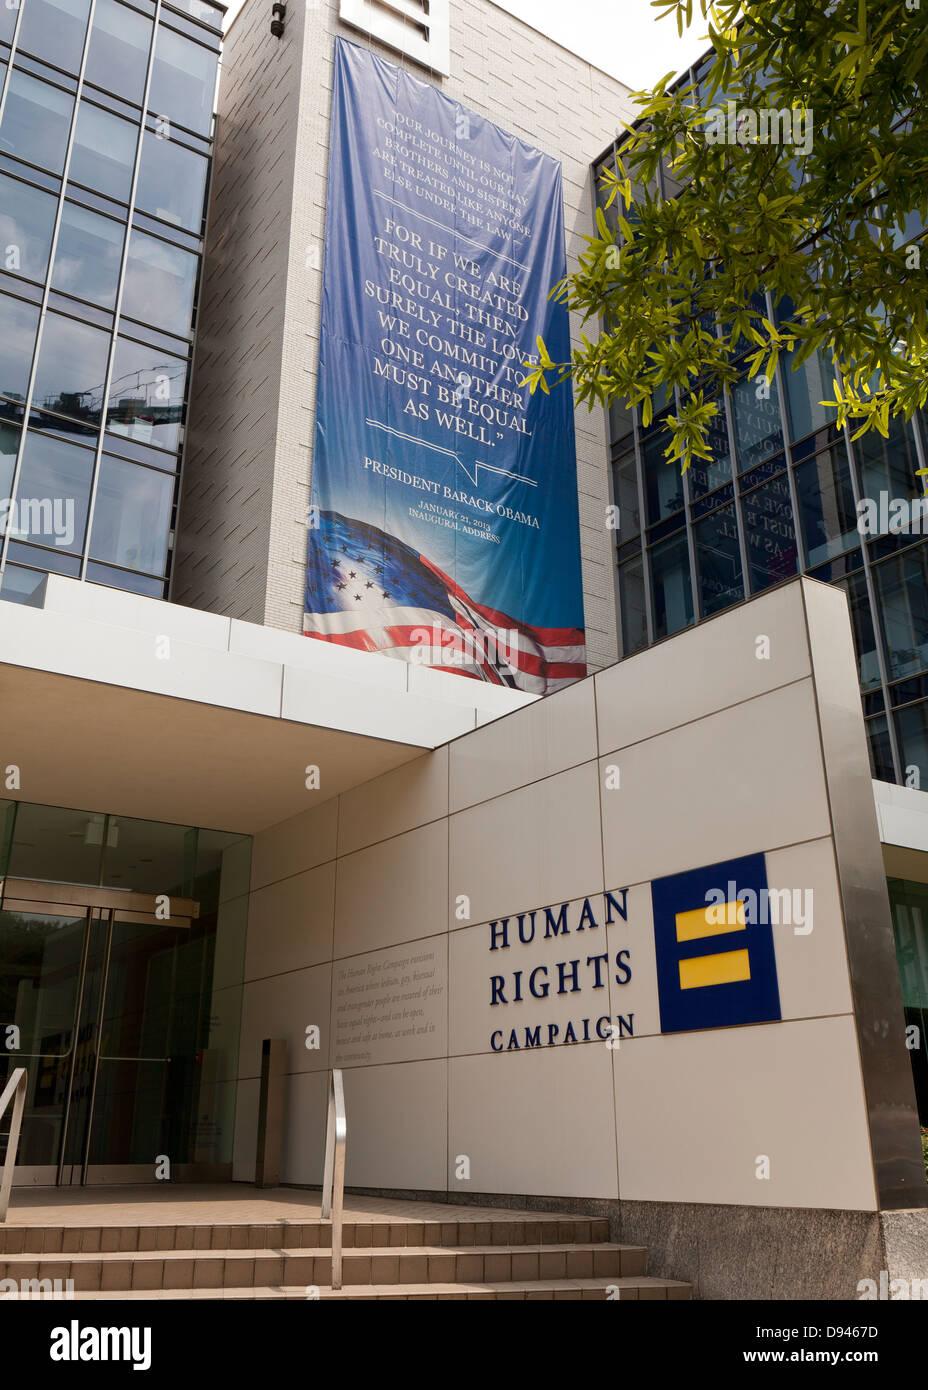 Human Rights Campaign building  - Washington, DC USA - Stock Image